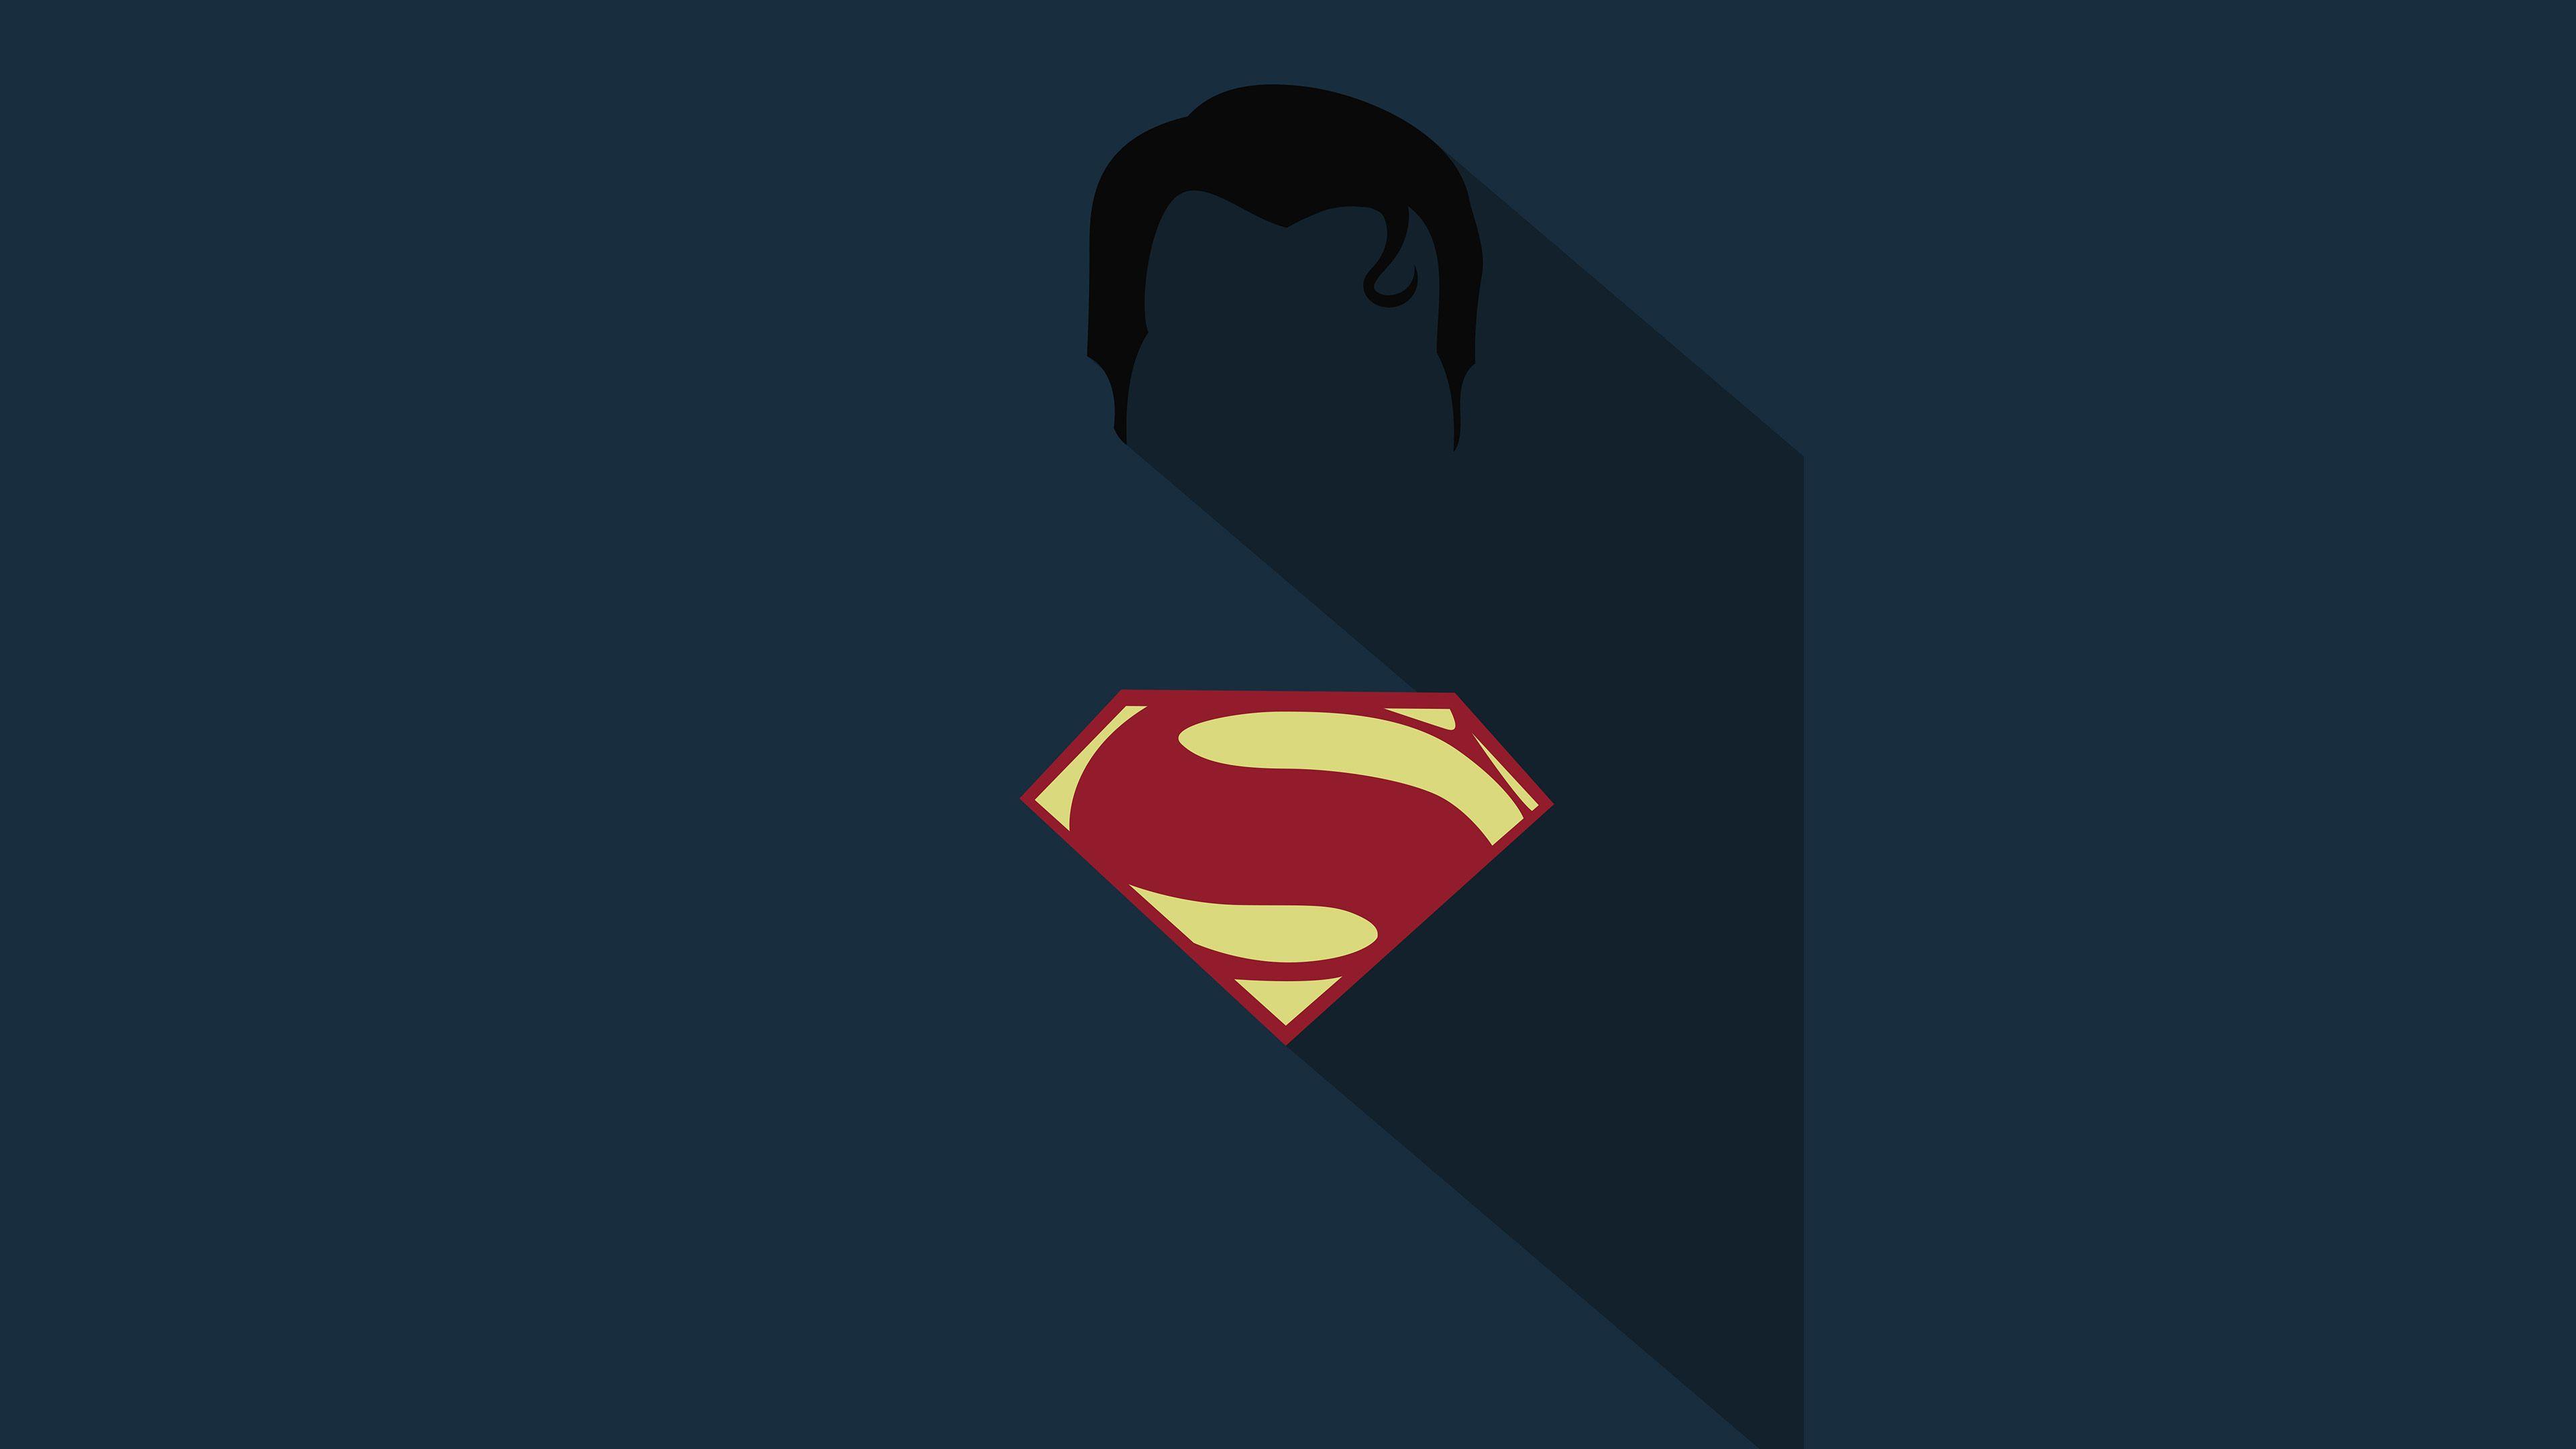 Superman Minimalism Poster HD http//livewallpaperswide